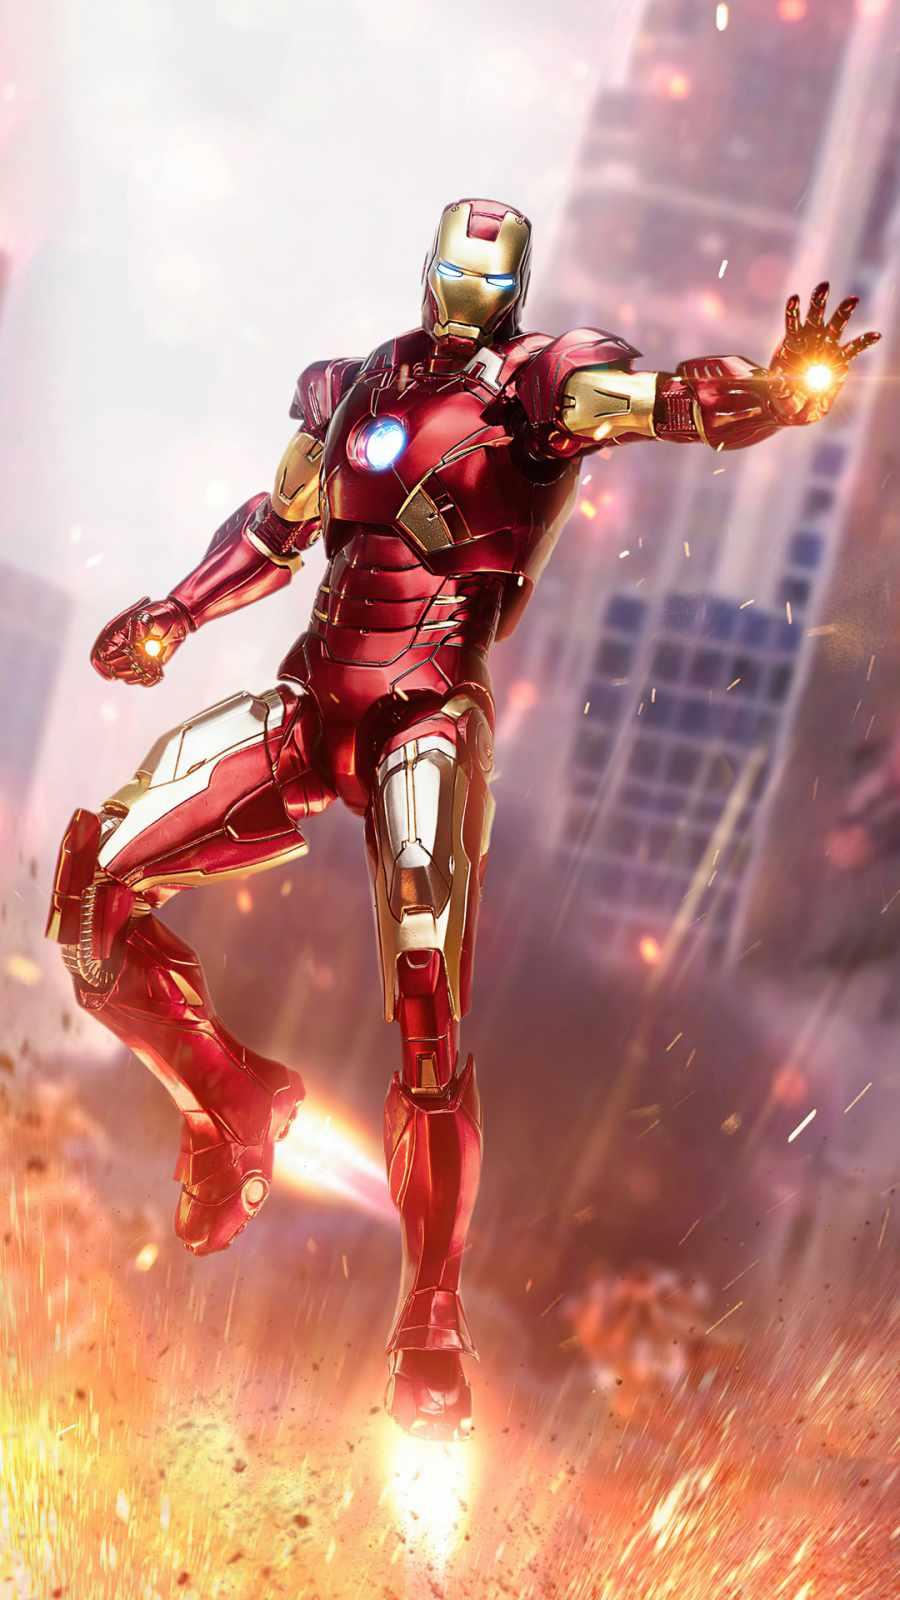 Iron Man no more mercy